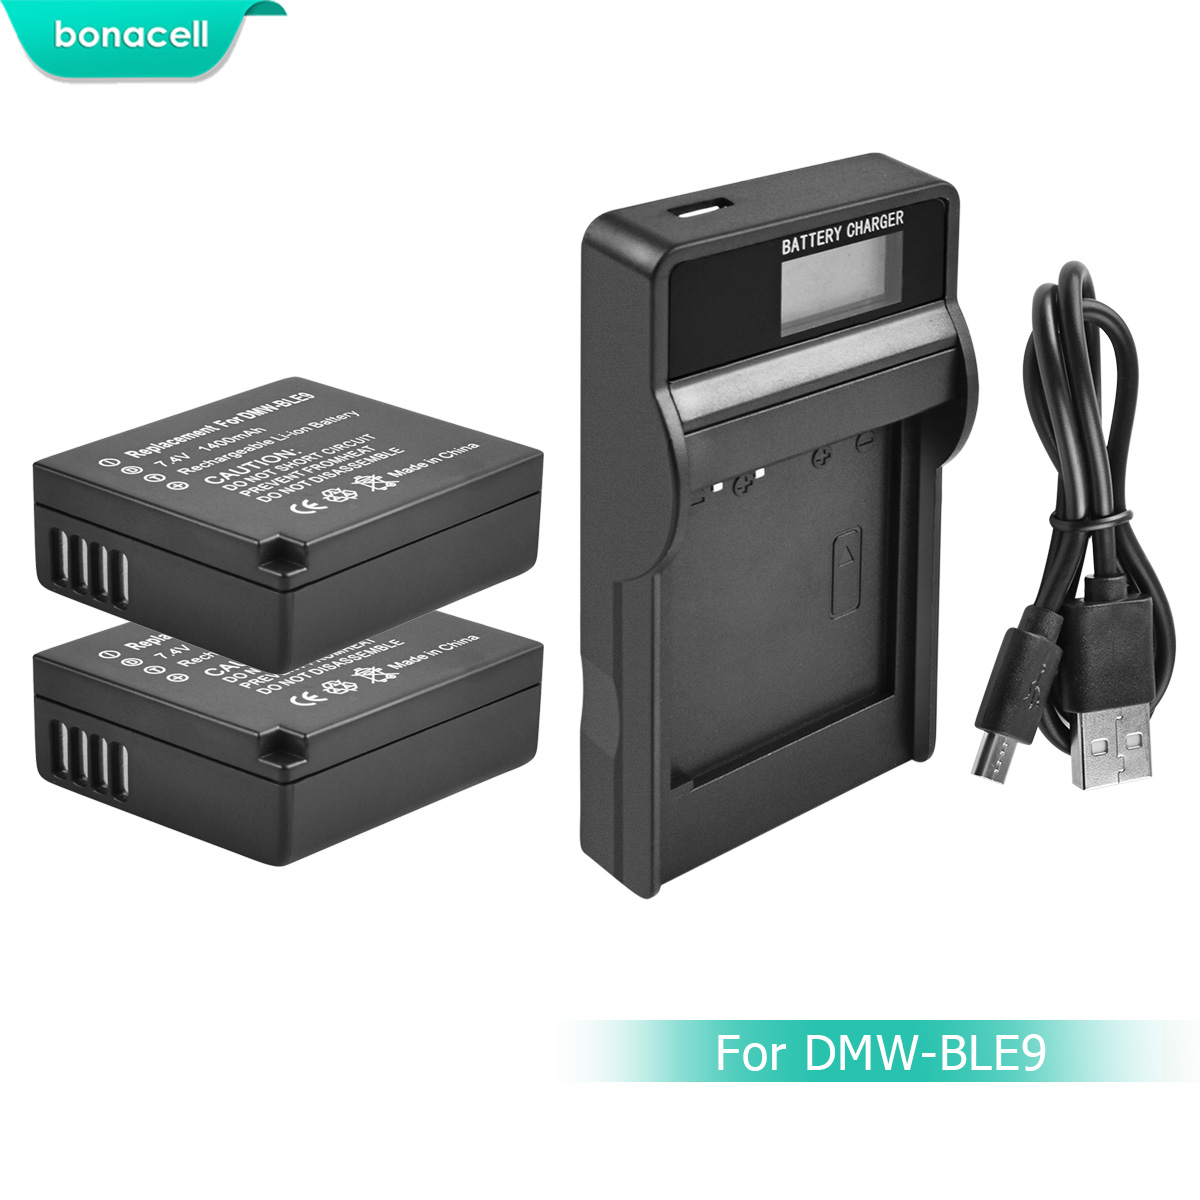 Bonacell DMW-BLG10 DMW BLG10 DMW-BLE9 Camera Battery+LCD Charger for Panasonic DMC GF6 GX7 GF3 GF5 DMW-BLG10GK LX100 GX80 L10